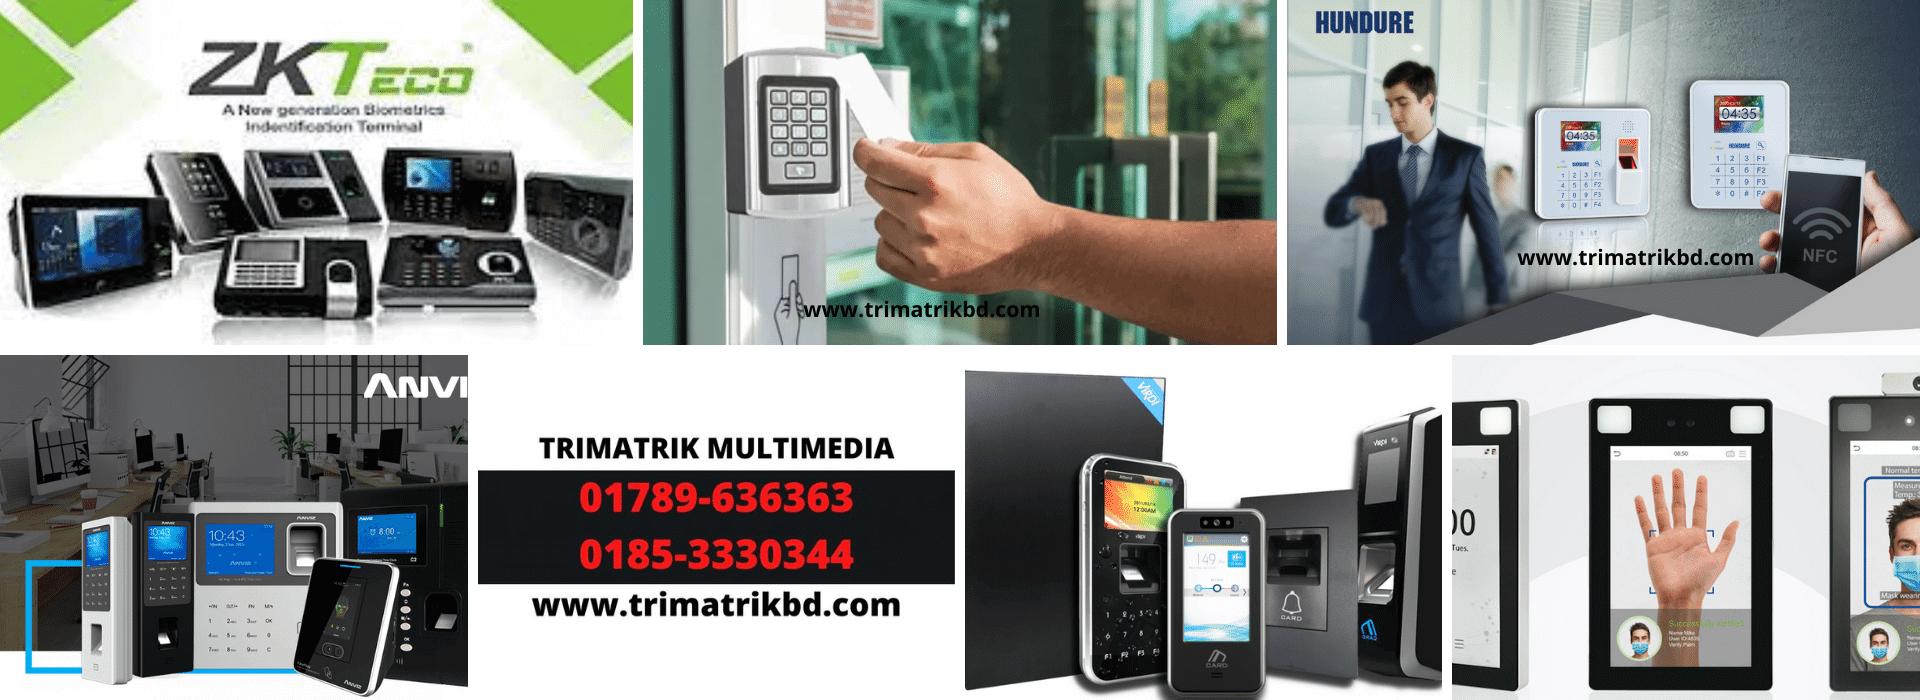 Access Control & Time Attendance Supplier in Bangladesh, TRIMATRIK